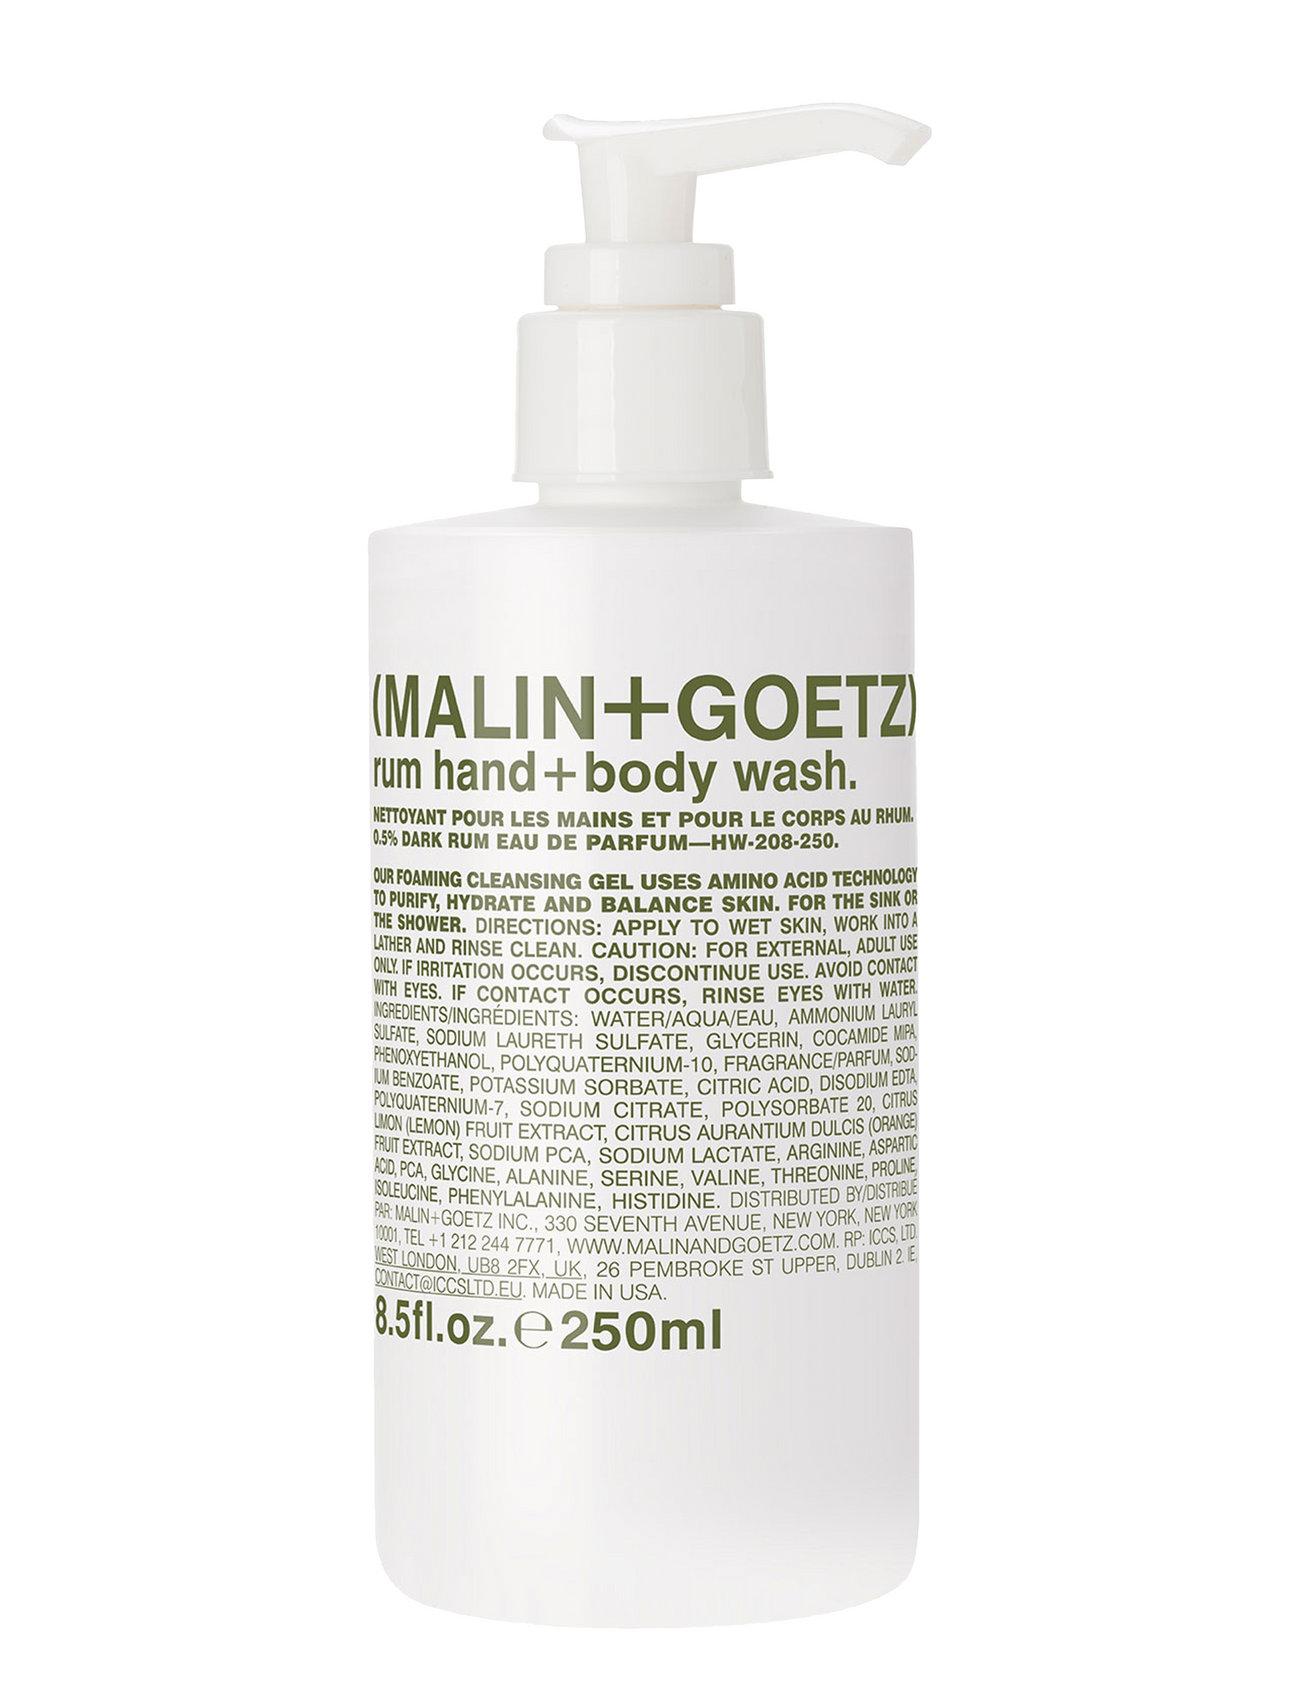 malin+goetz Rum hand + body wash fra boozt.com dk